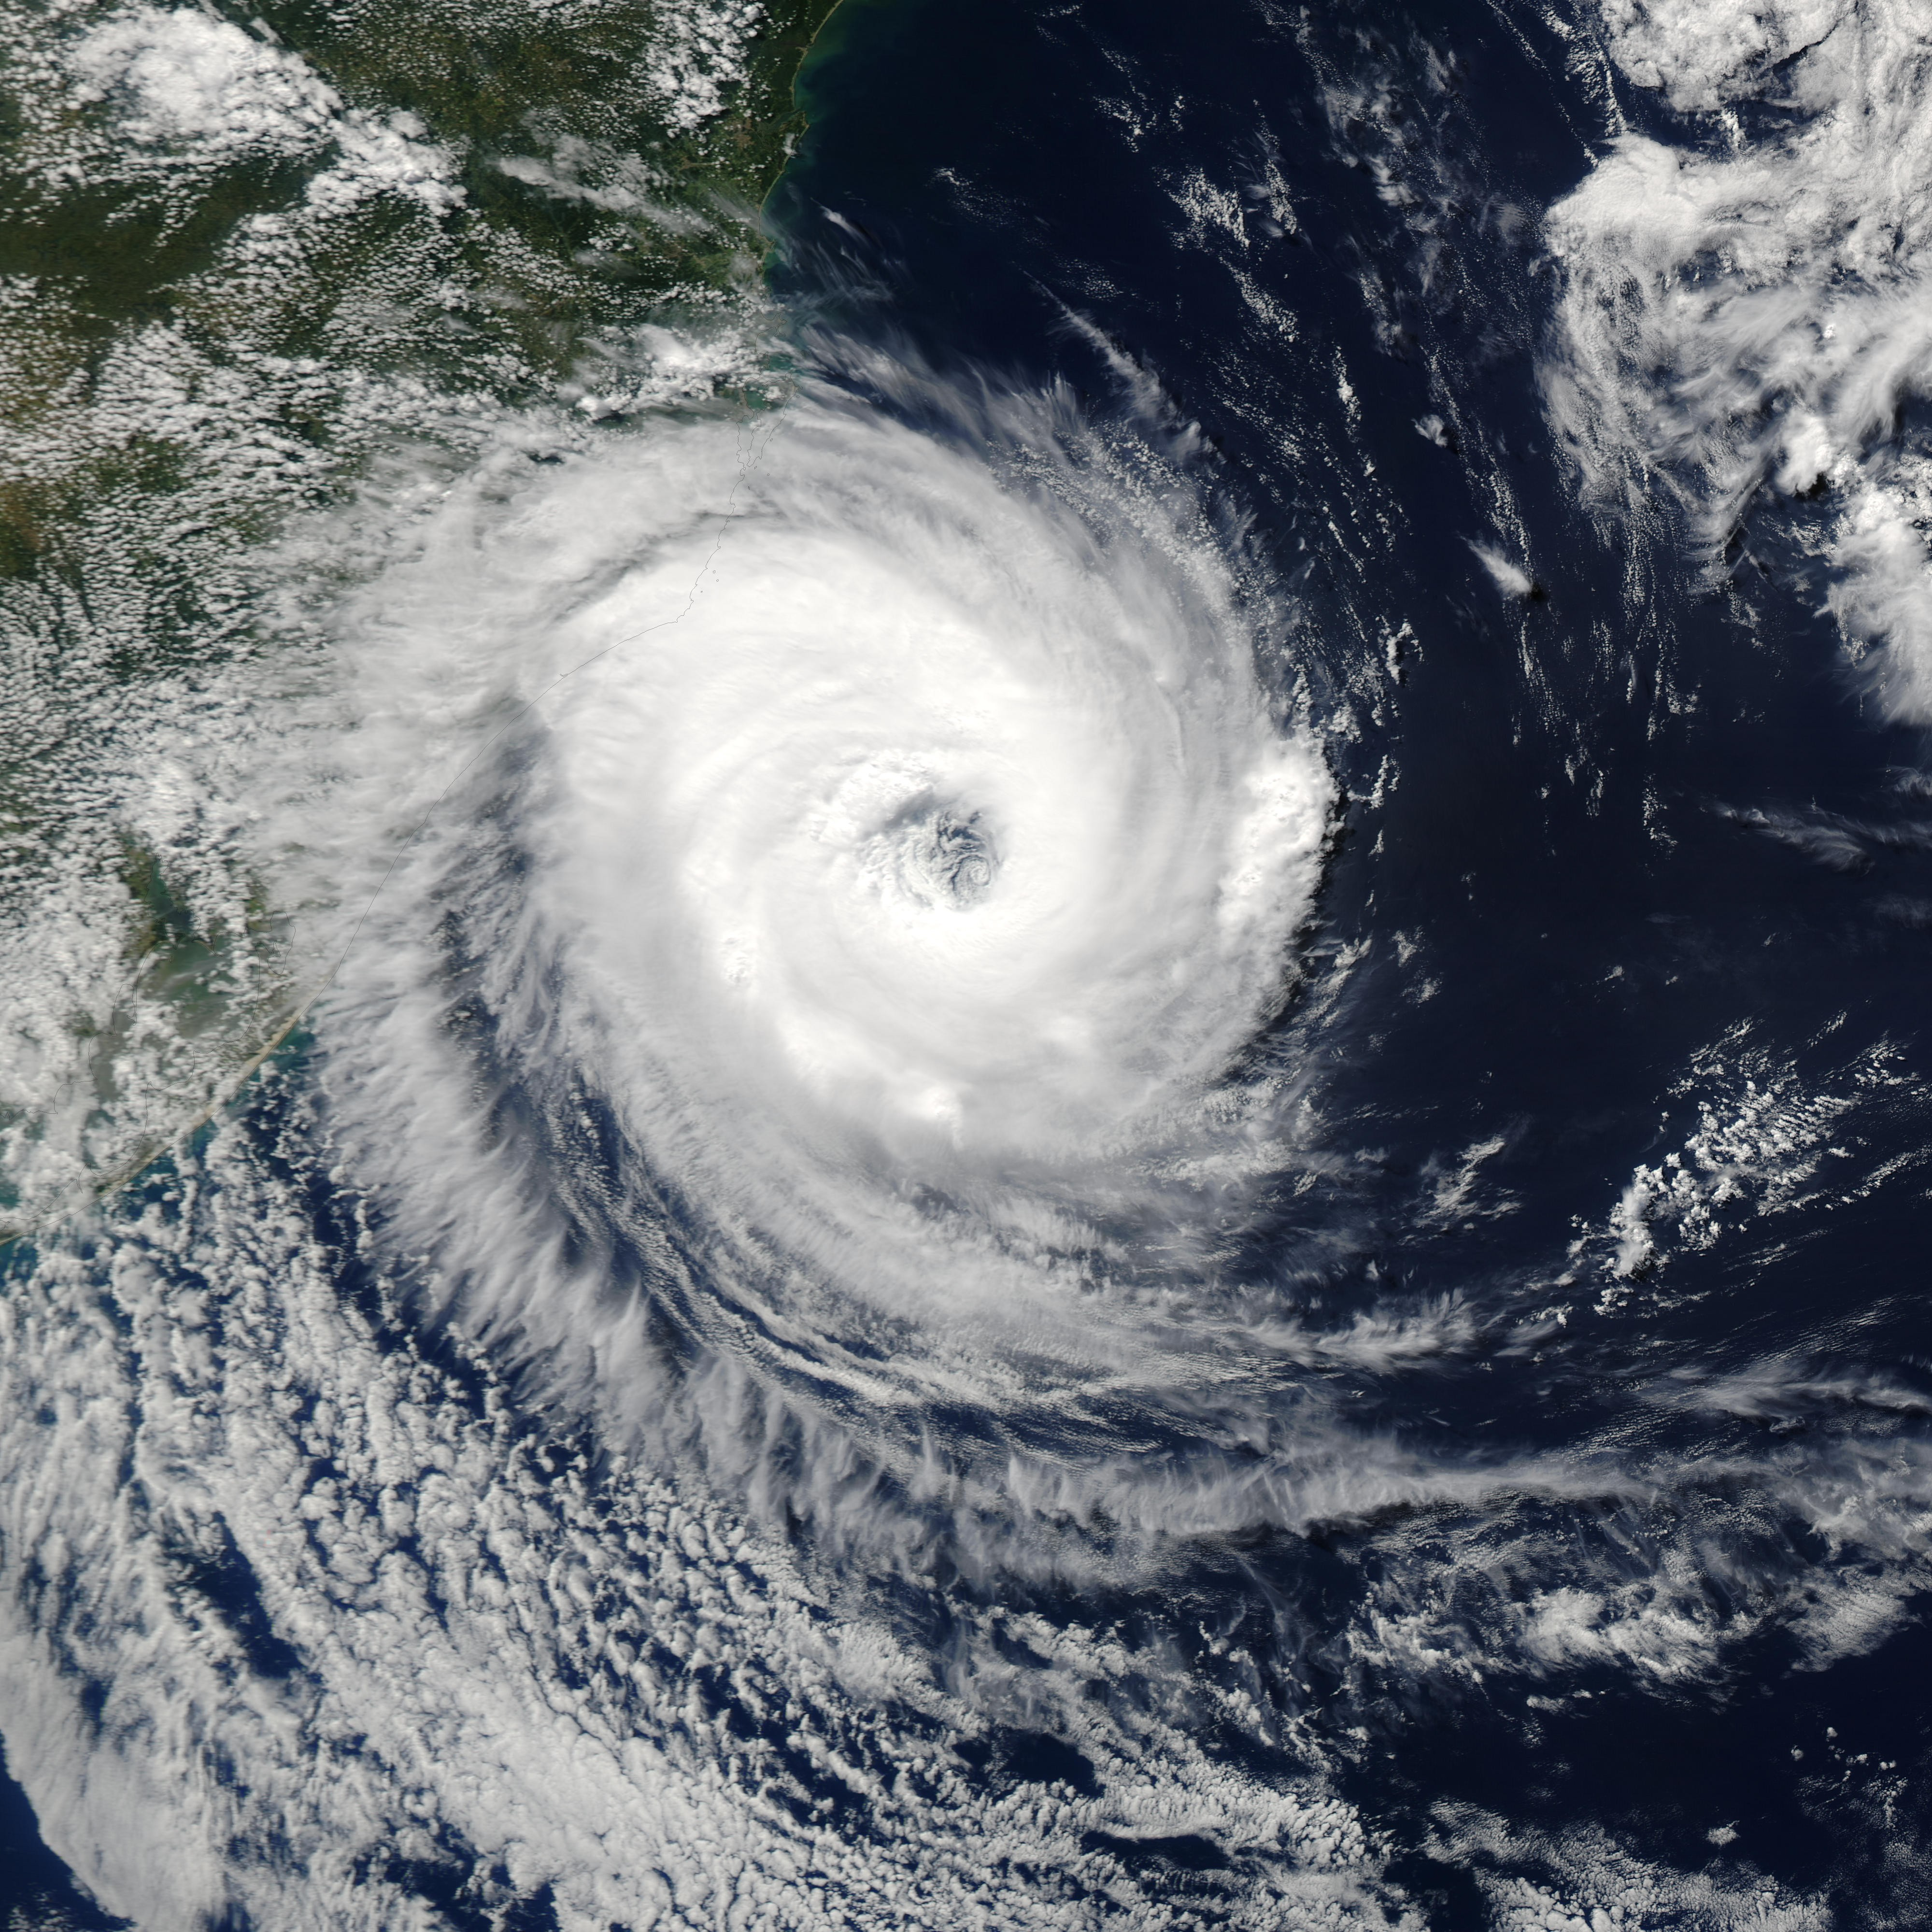 http://upload.wikimedia.org/wikipedia/commons/b/bd/Cyclone_Catarina_2004.jpg